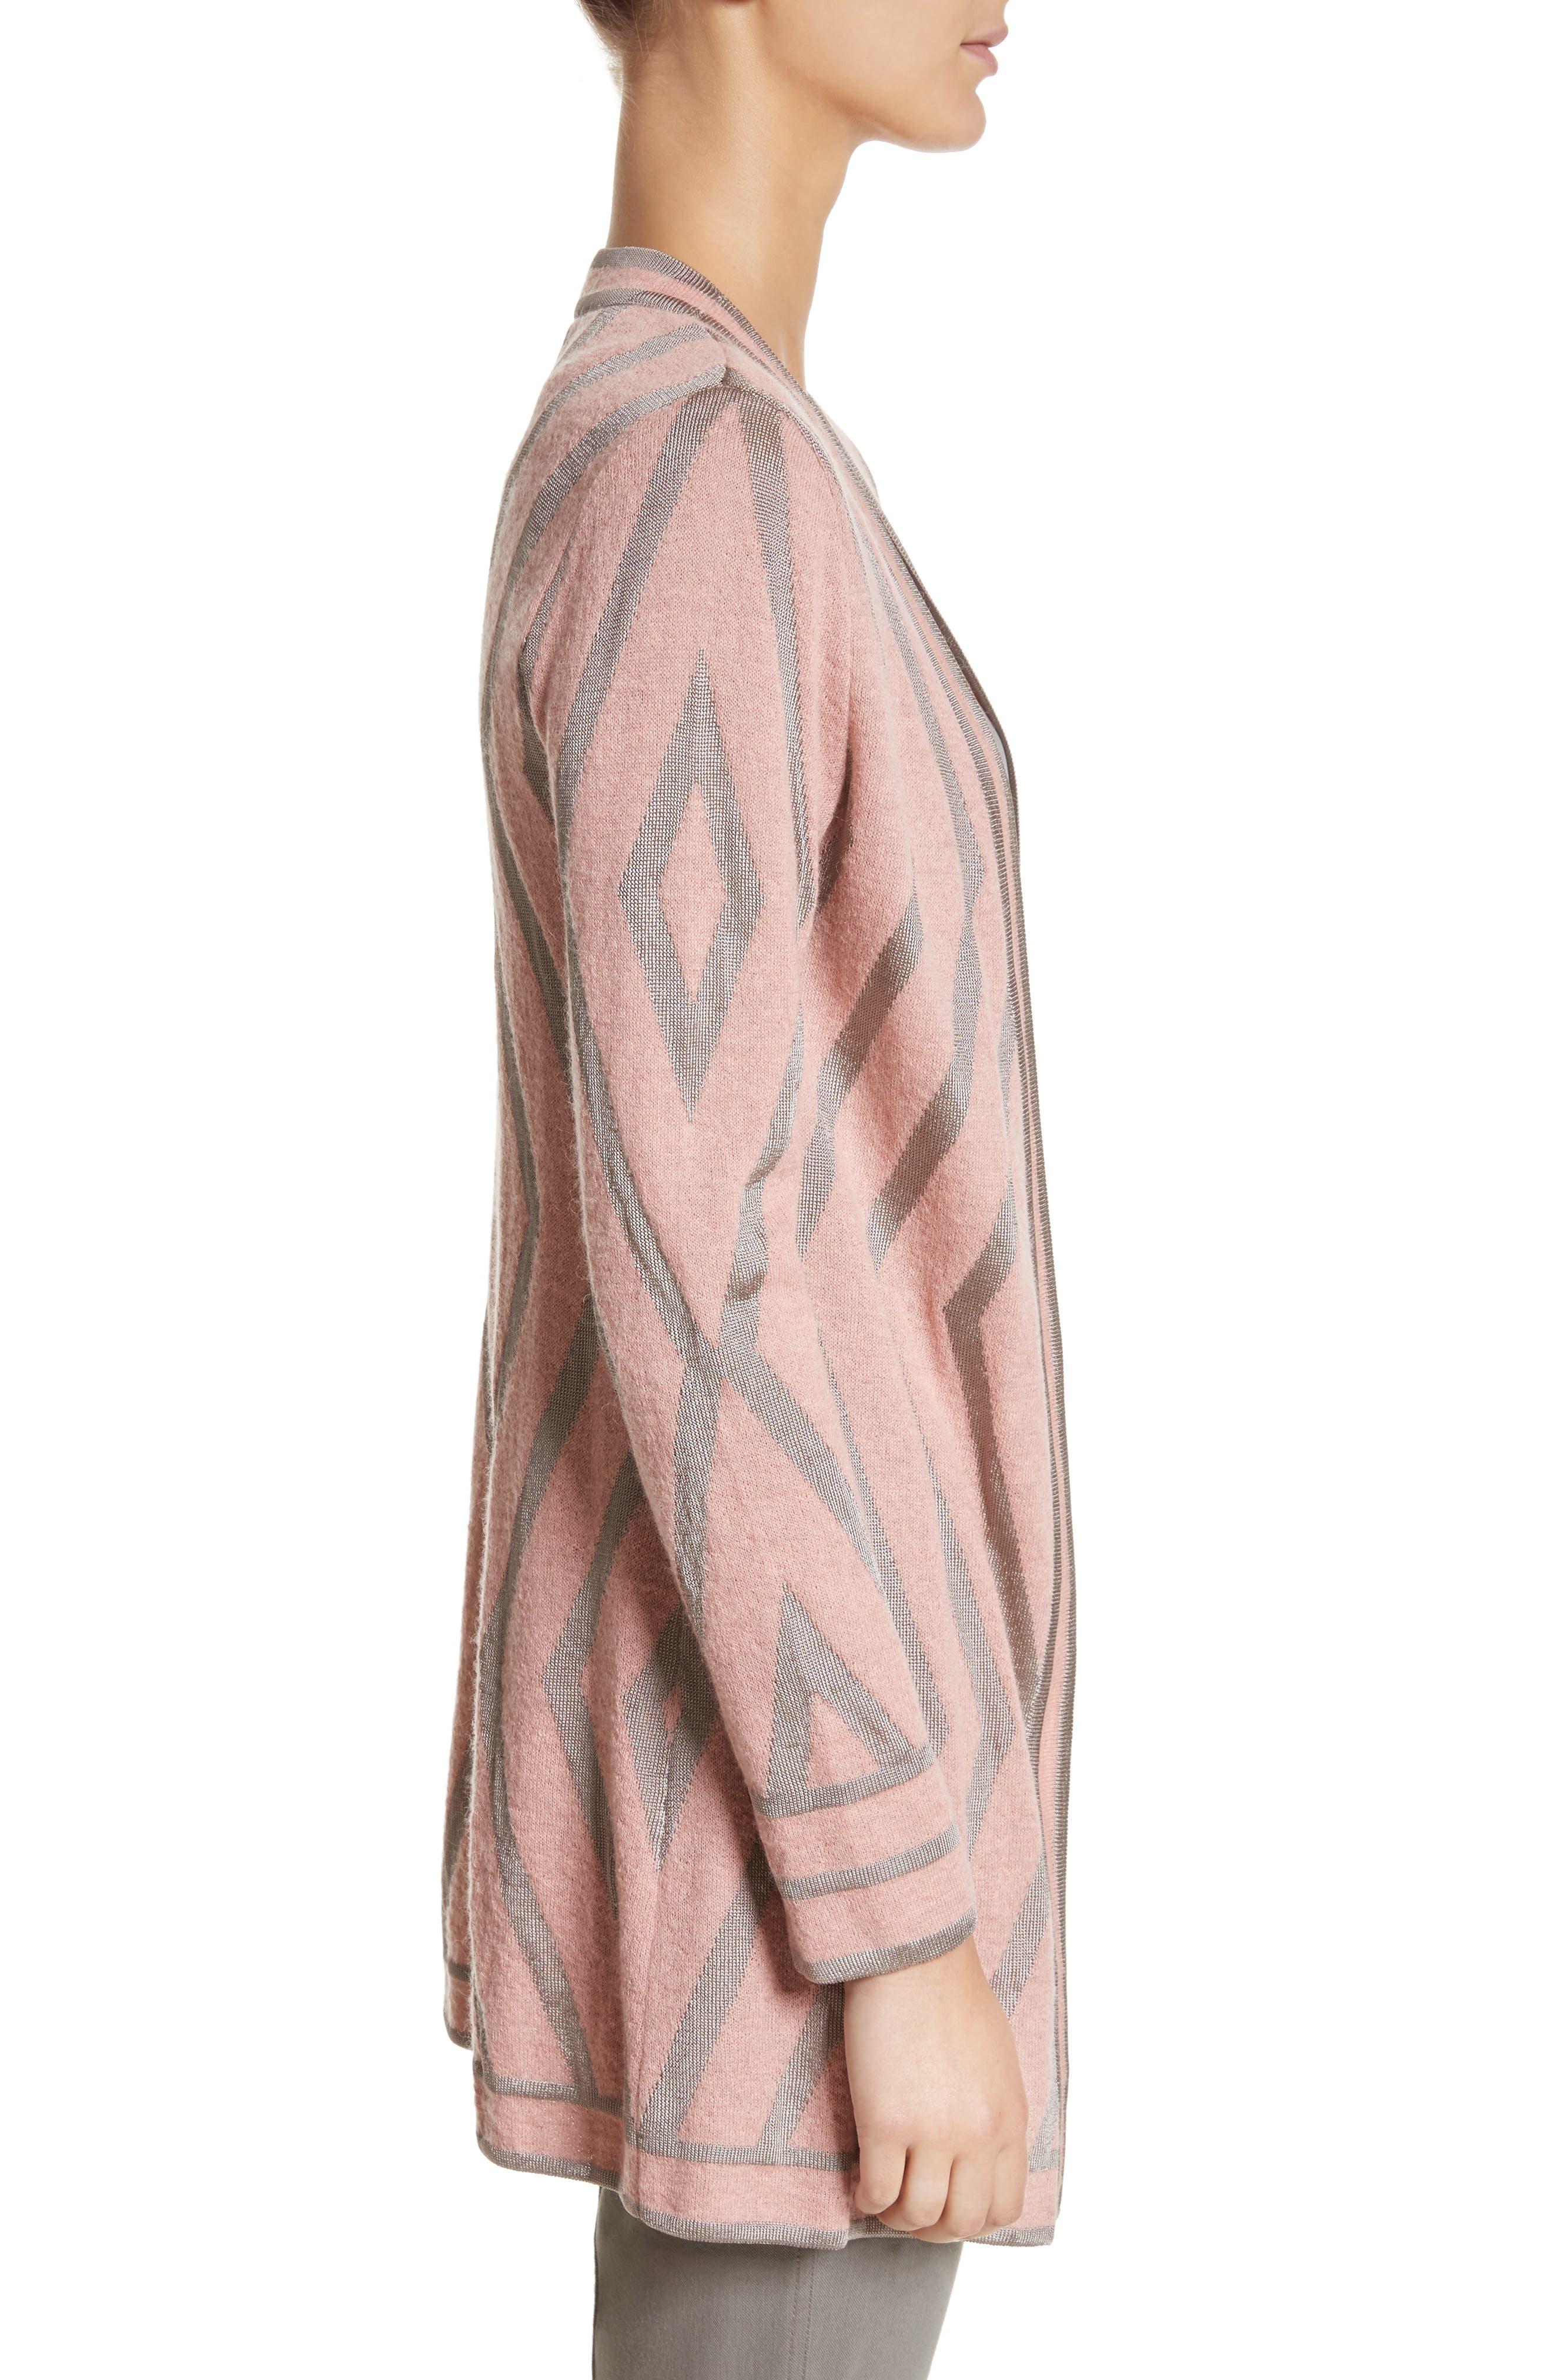 ST. JOHN COLLECTION,                             Matte Shine Geo Jacquard Knit Cardigan,                             Alternate thumbnail 3, color,                             680